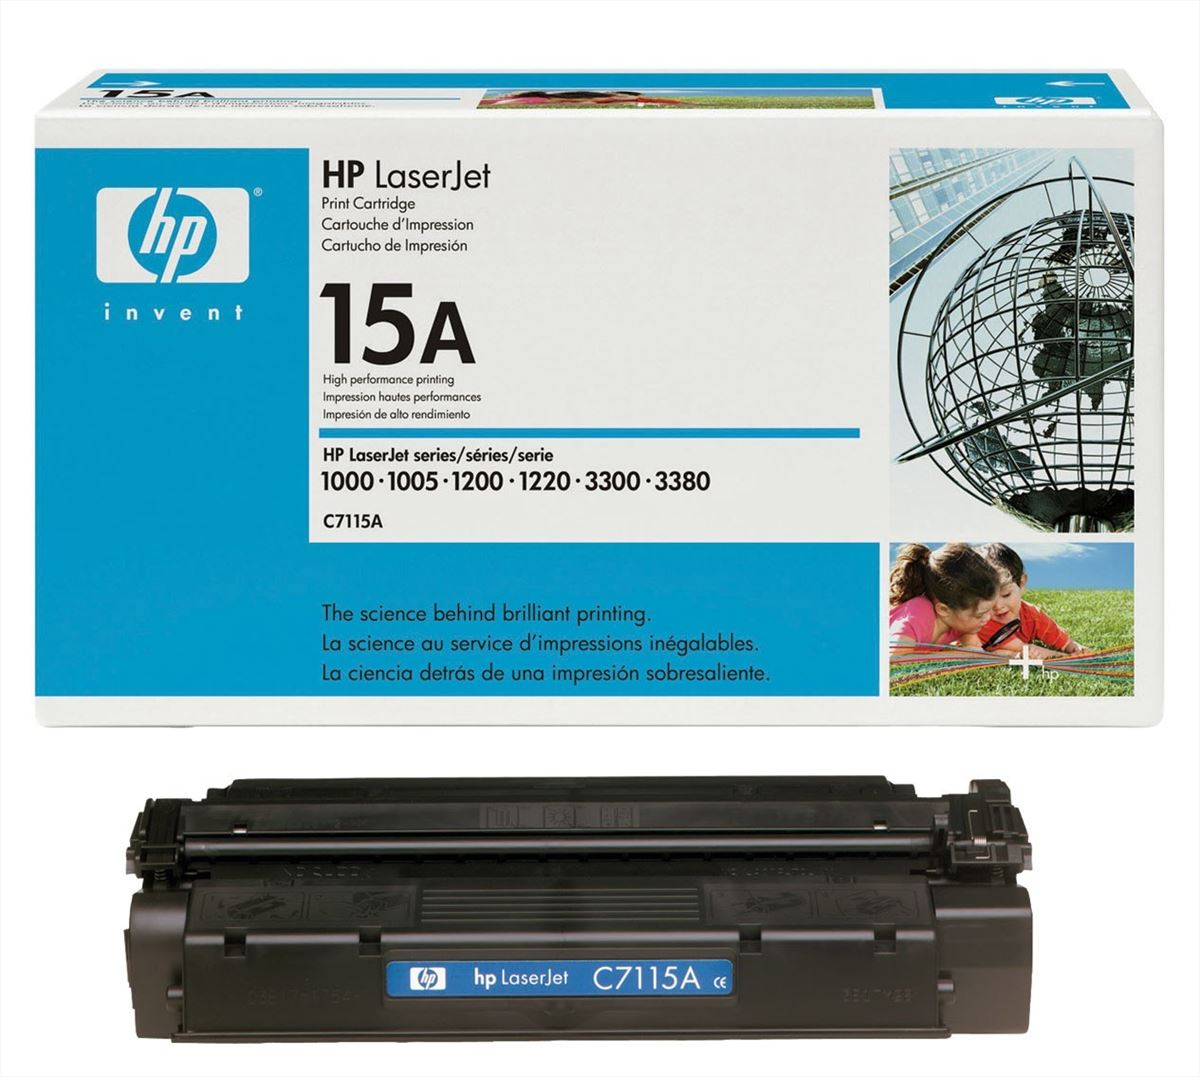 TONER HP C7115A 2500PP X STAMPANTE LASERJET 1000, 1200, 3300